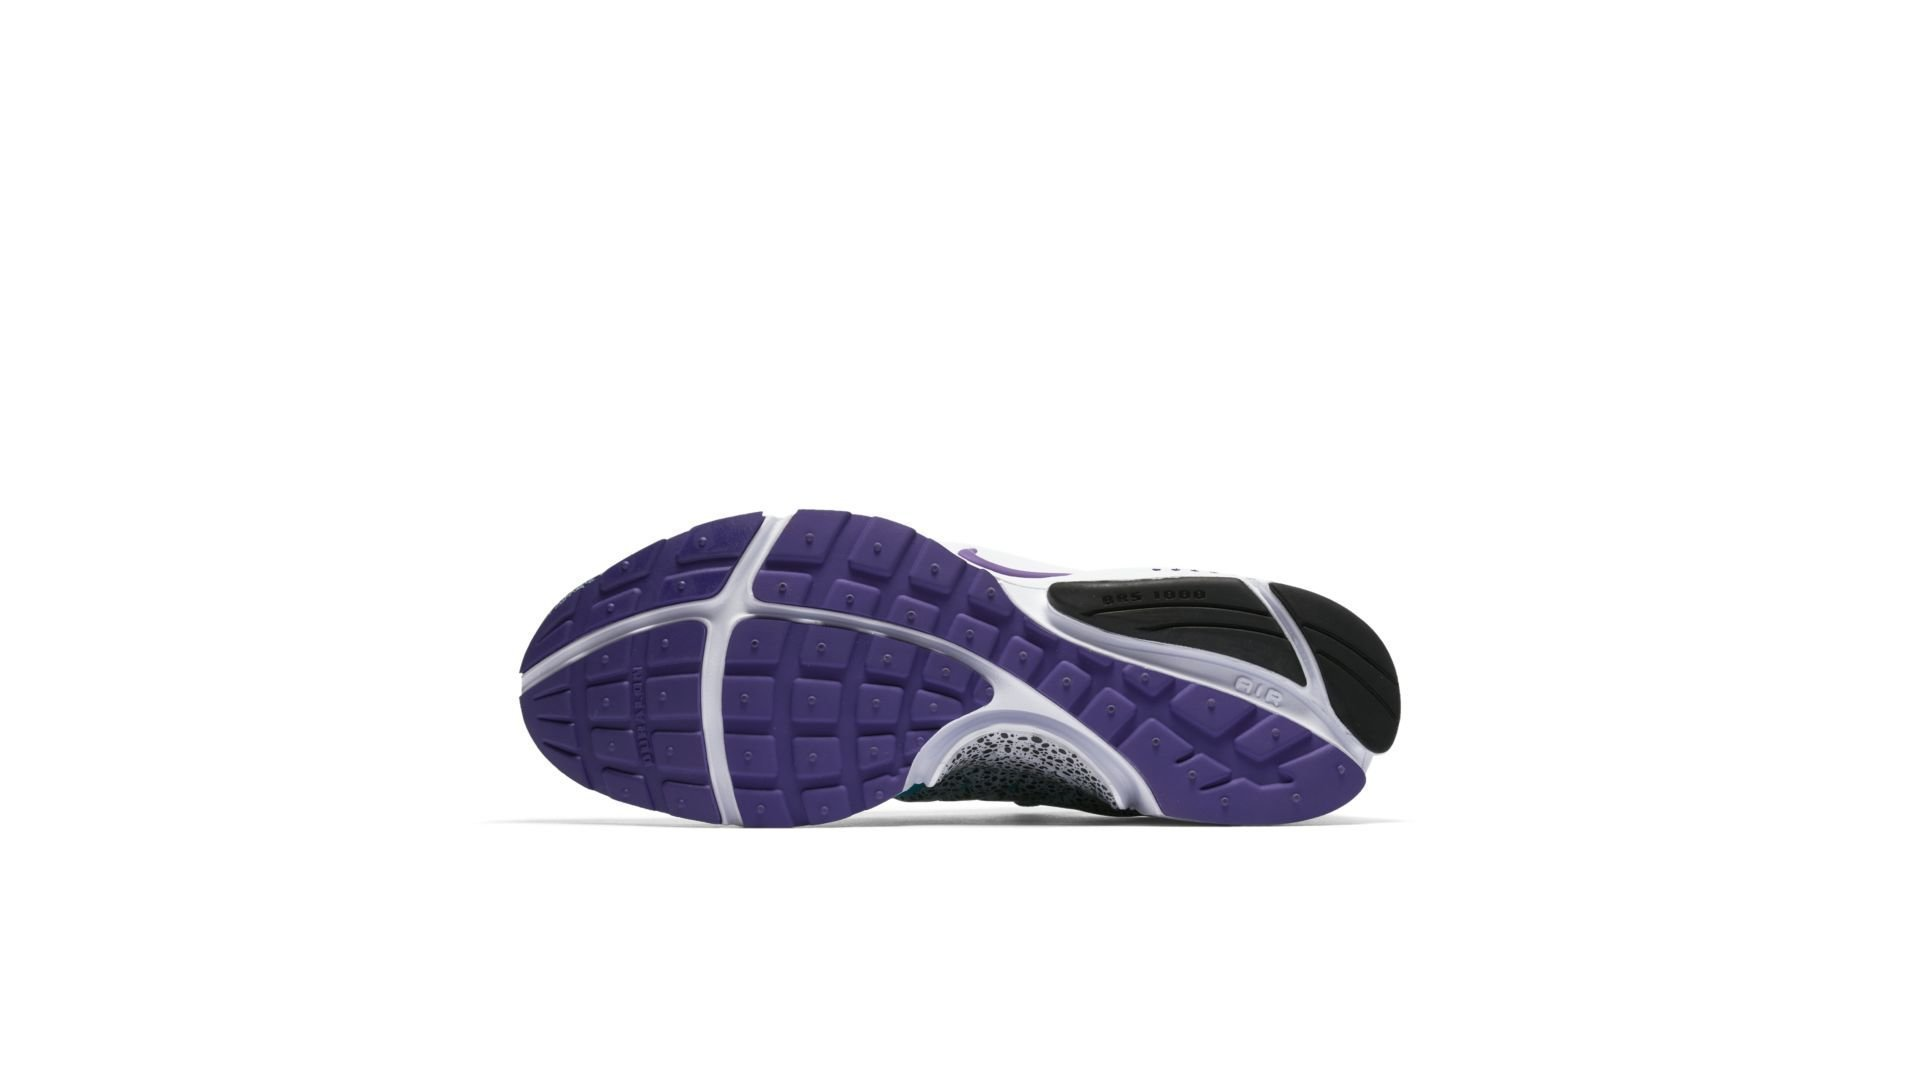 Nike Air Presto Safari Turbo Green (886043-300)